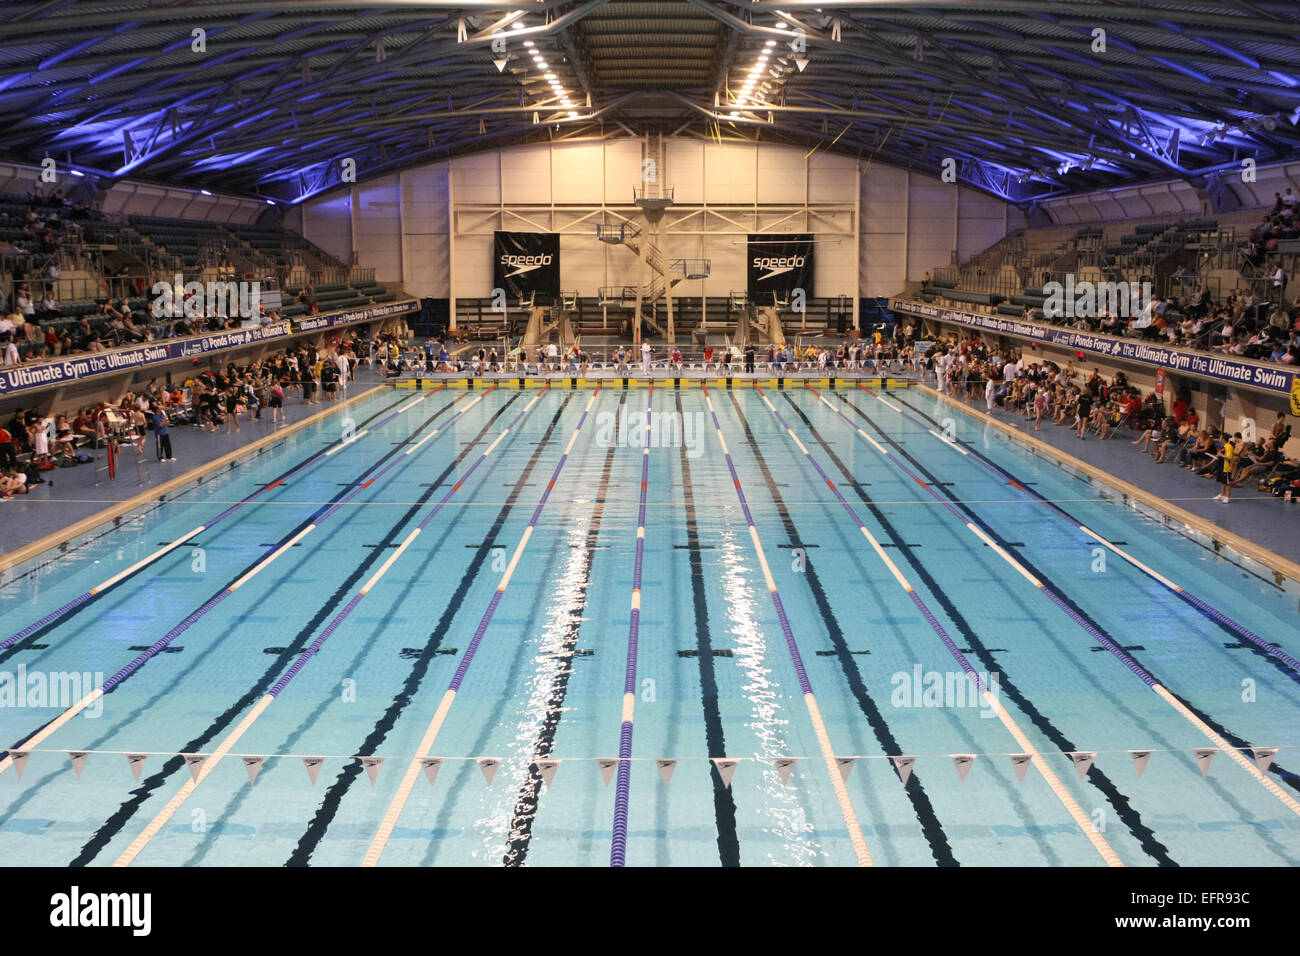 Sheffield Ponds Forge International Swimming Pool Stock Photo Royalty Free Image 78573360 Alamy